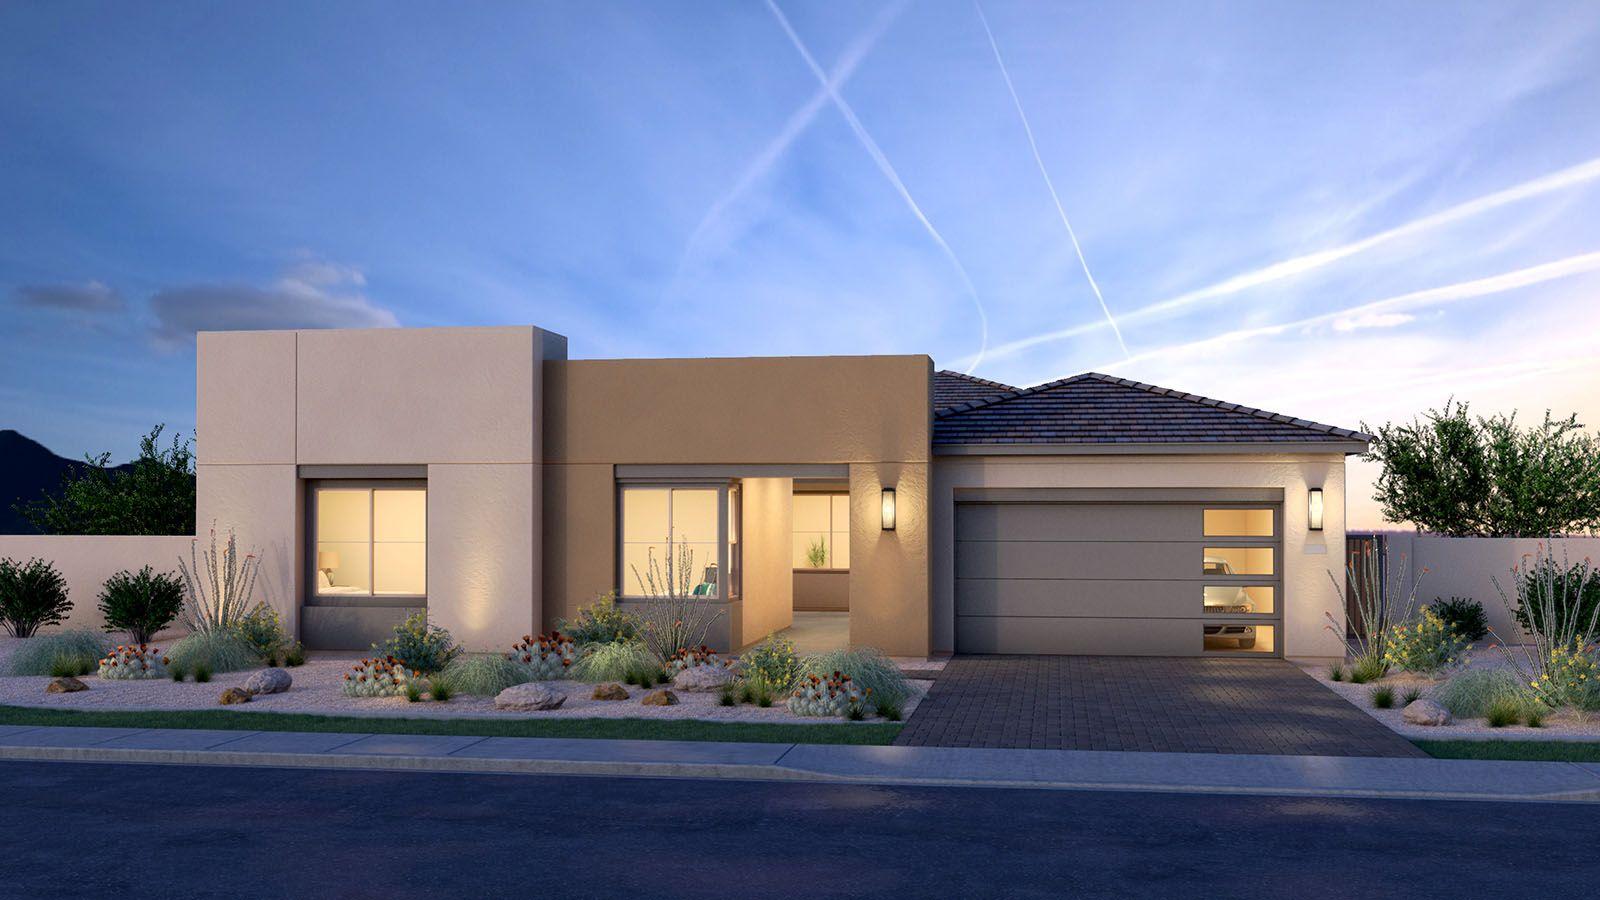 MH-residence-Canopy-South-58-5-C-DUSK-R:Modern Southwest Elevation